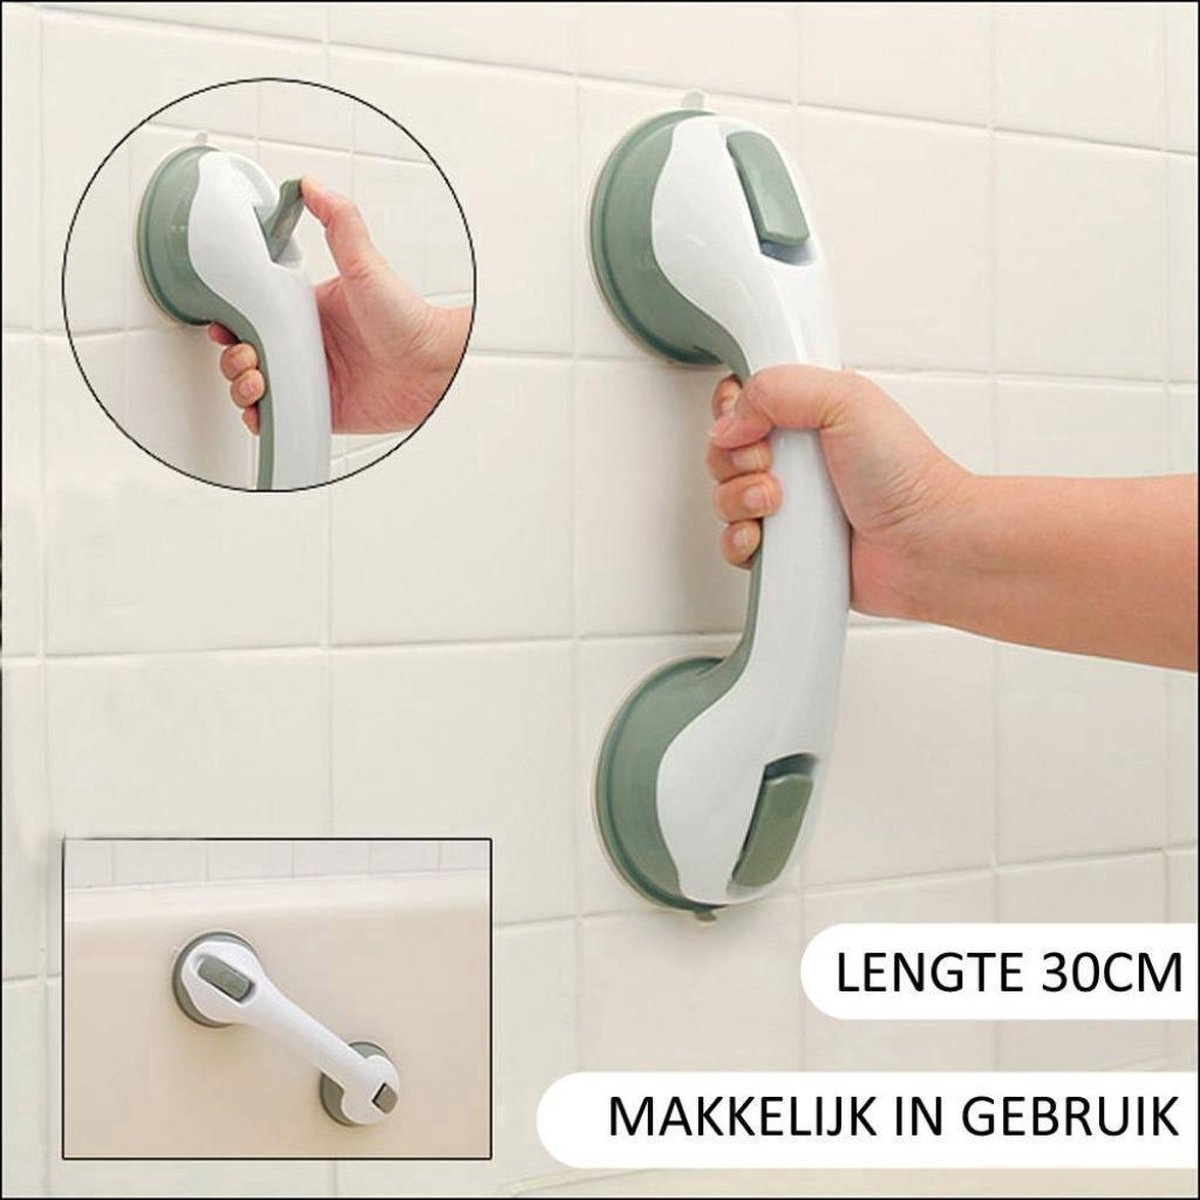 Zuignap Handgreep Badkamer - Douche Handgreep Met Zuignap - Veiligheidsgreep - Helping Hand Handvat - Easy Grip